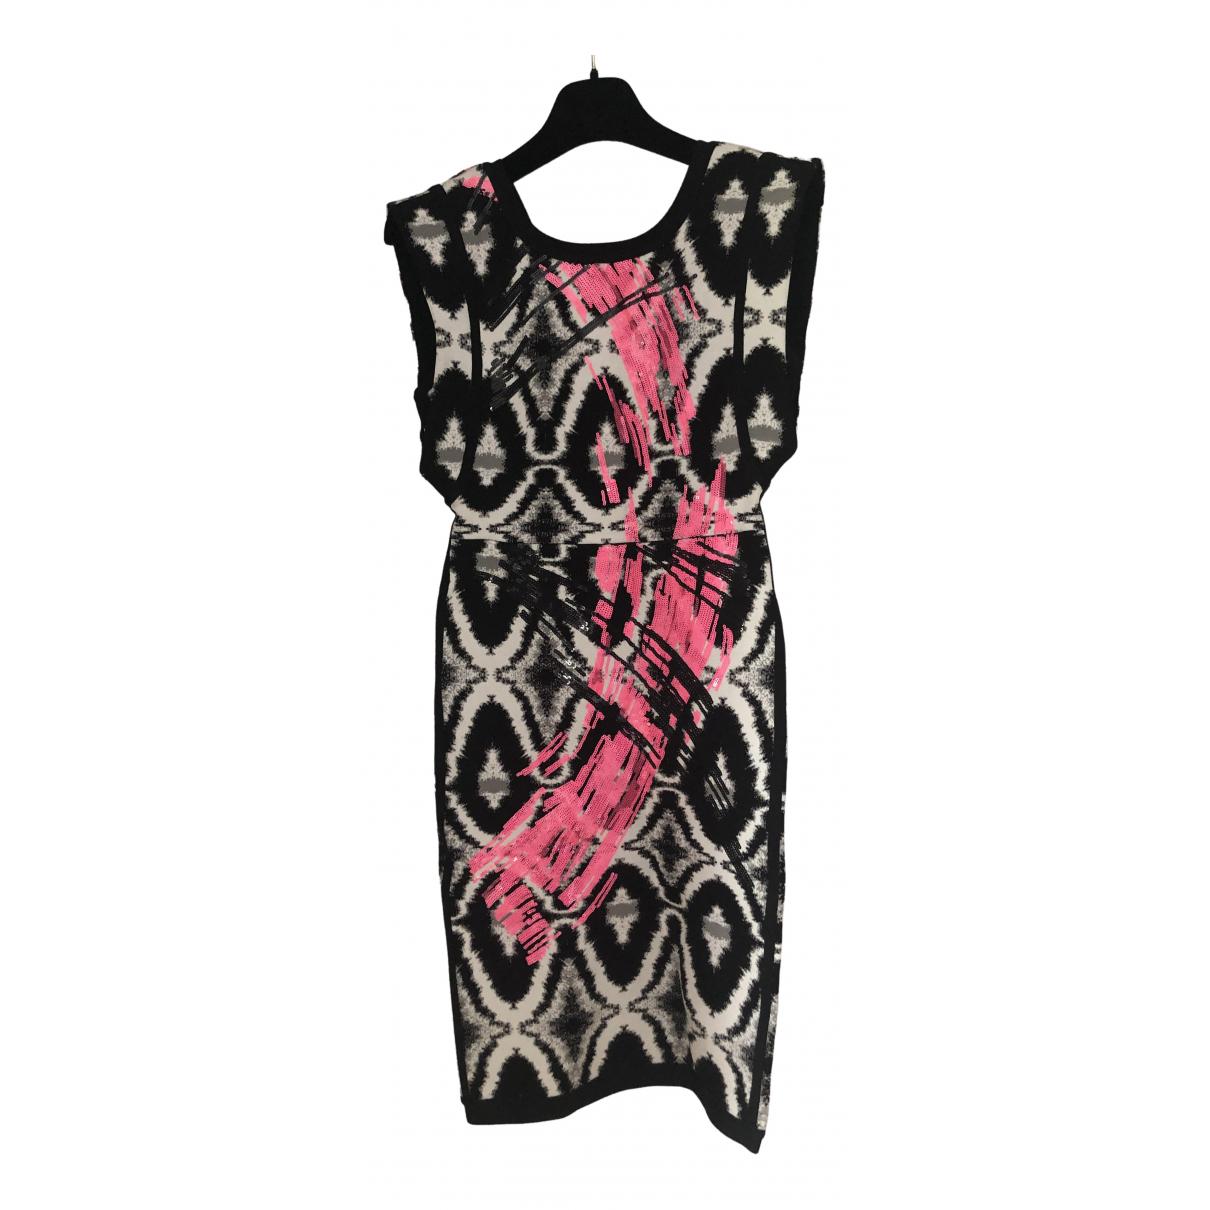 Herve Leger \N dress for Women XS International